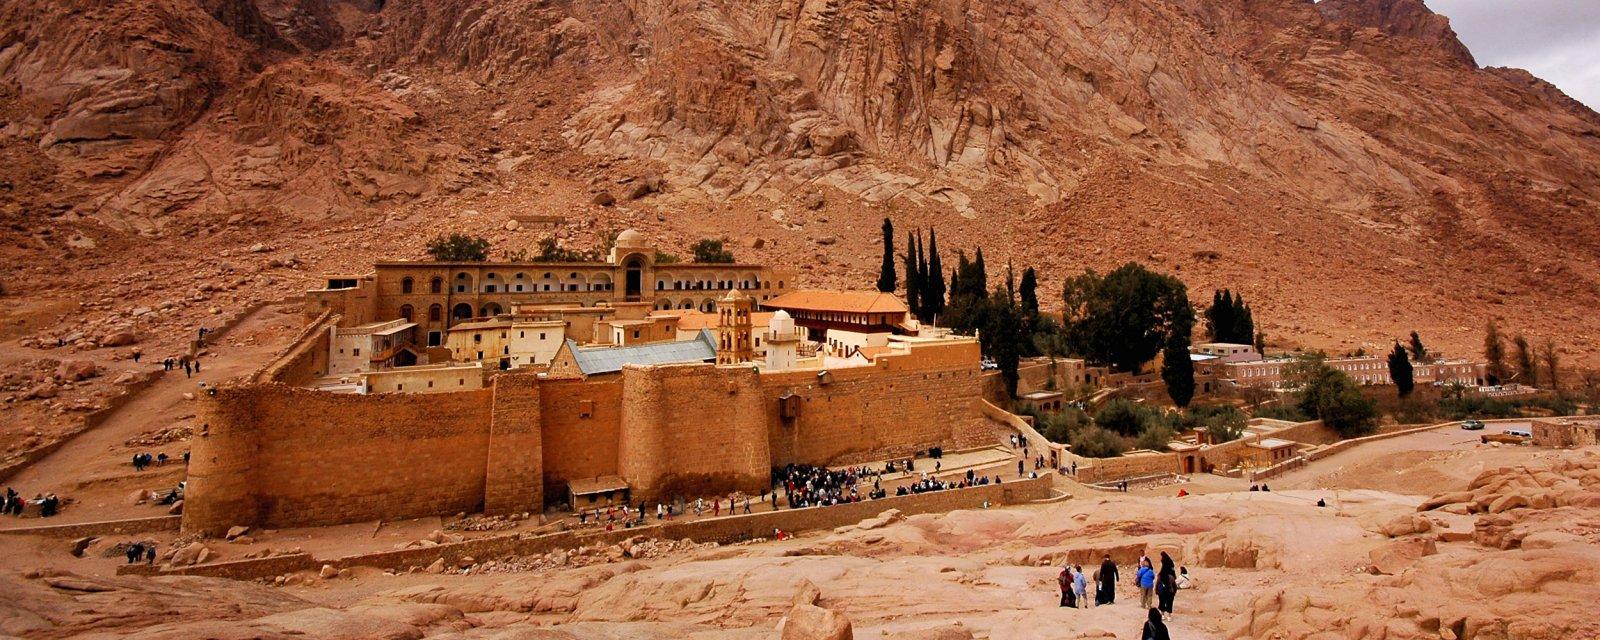 Монастырь Св. Екатерины + Дахаб из Шарм-эль-Шейха